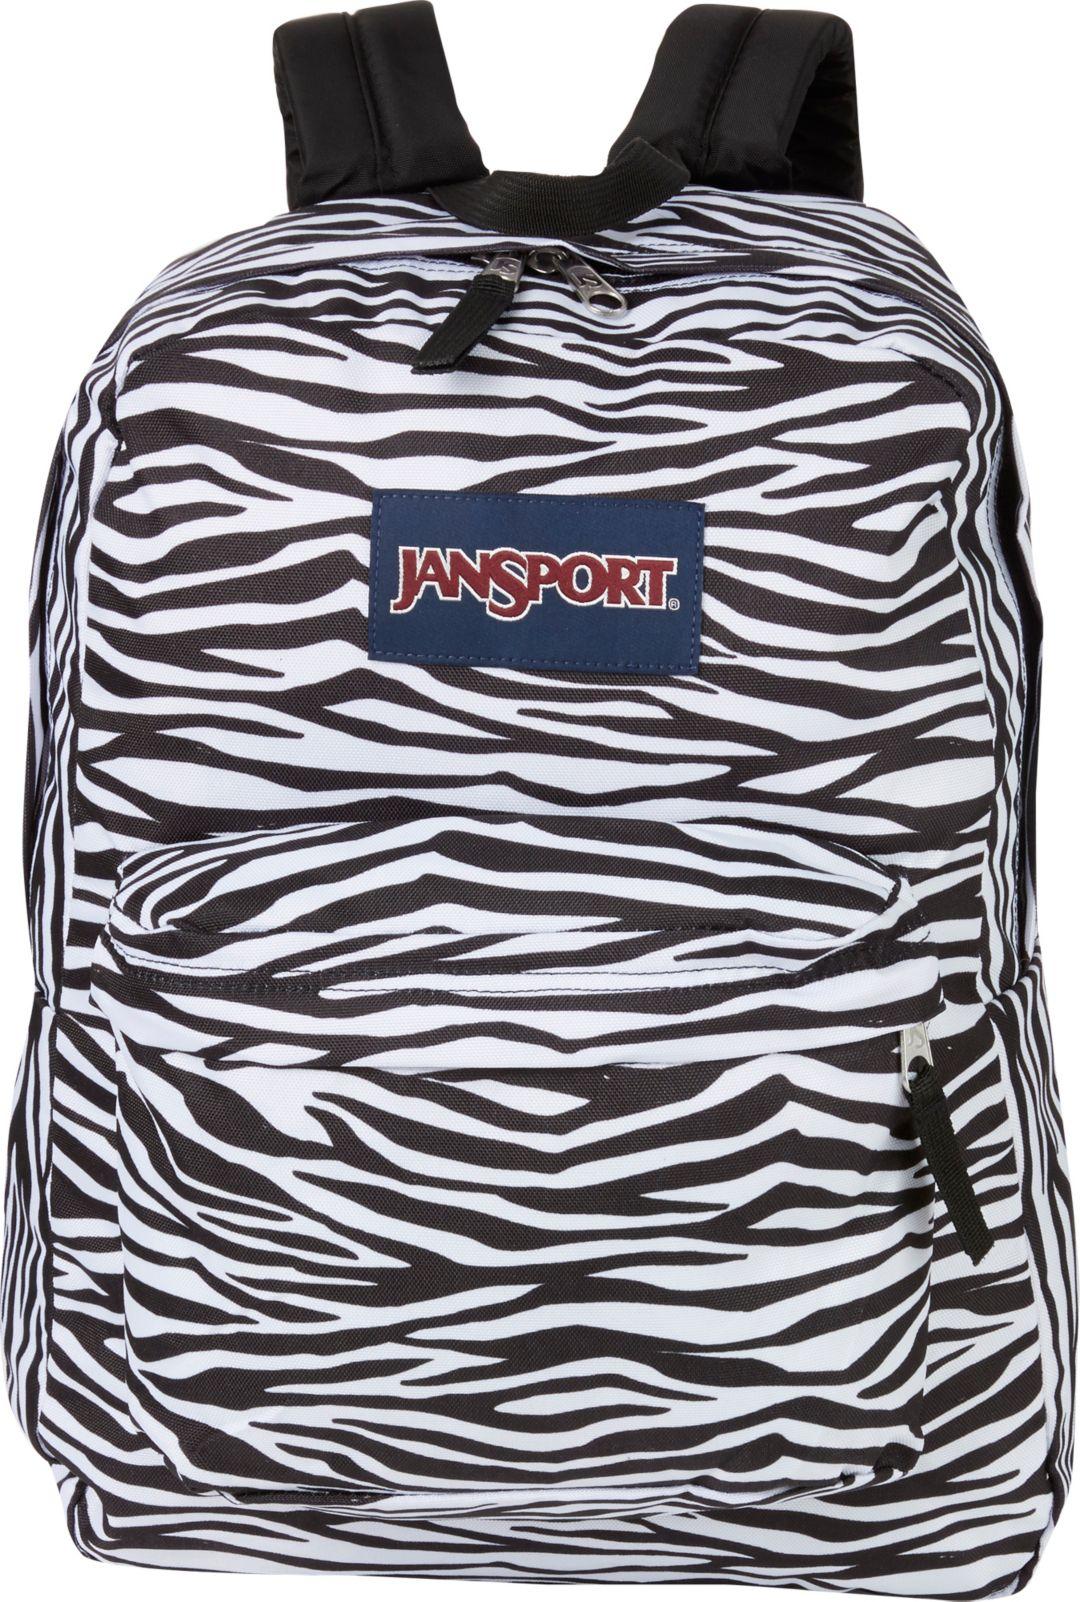 JanSport Superbreak Backpack   Best Price Guarantee at DICK'S